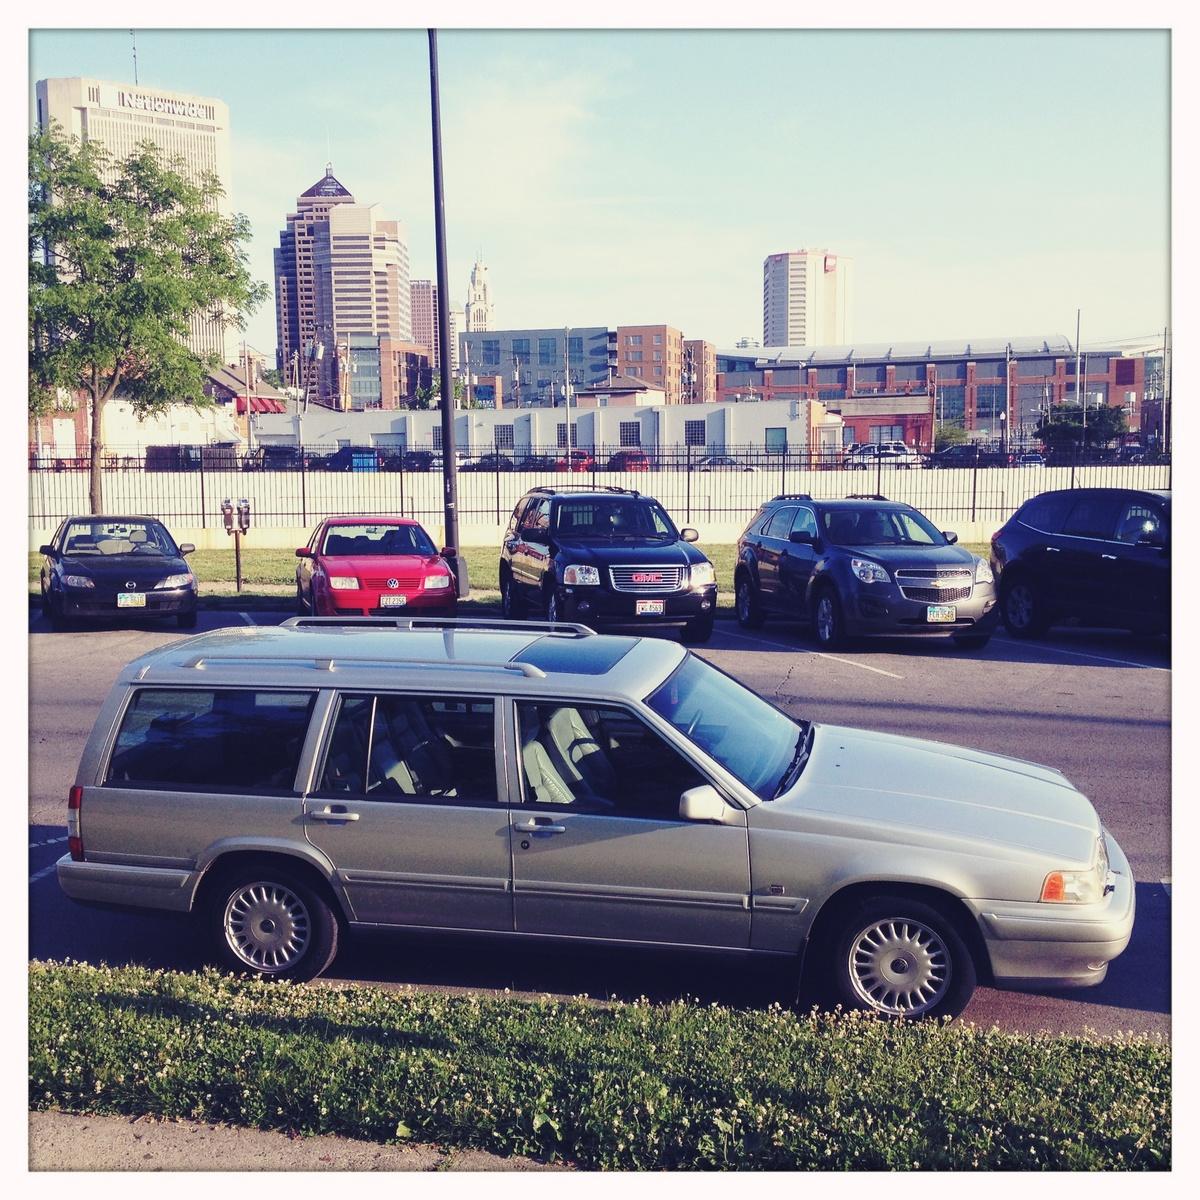 1997 Volvo 960 4 Dr STD Wagon, 97 Volvo 965, exterior